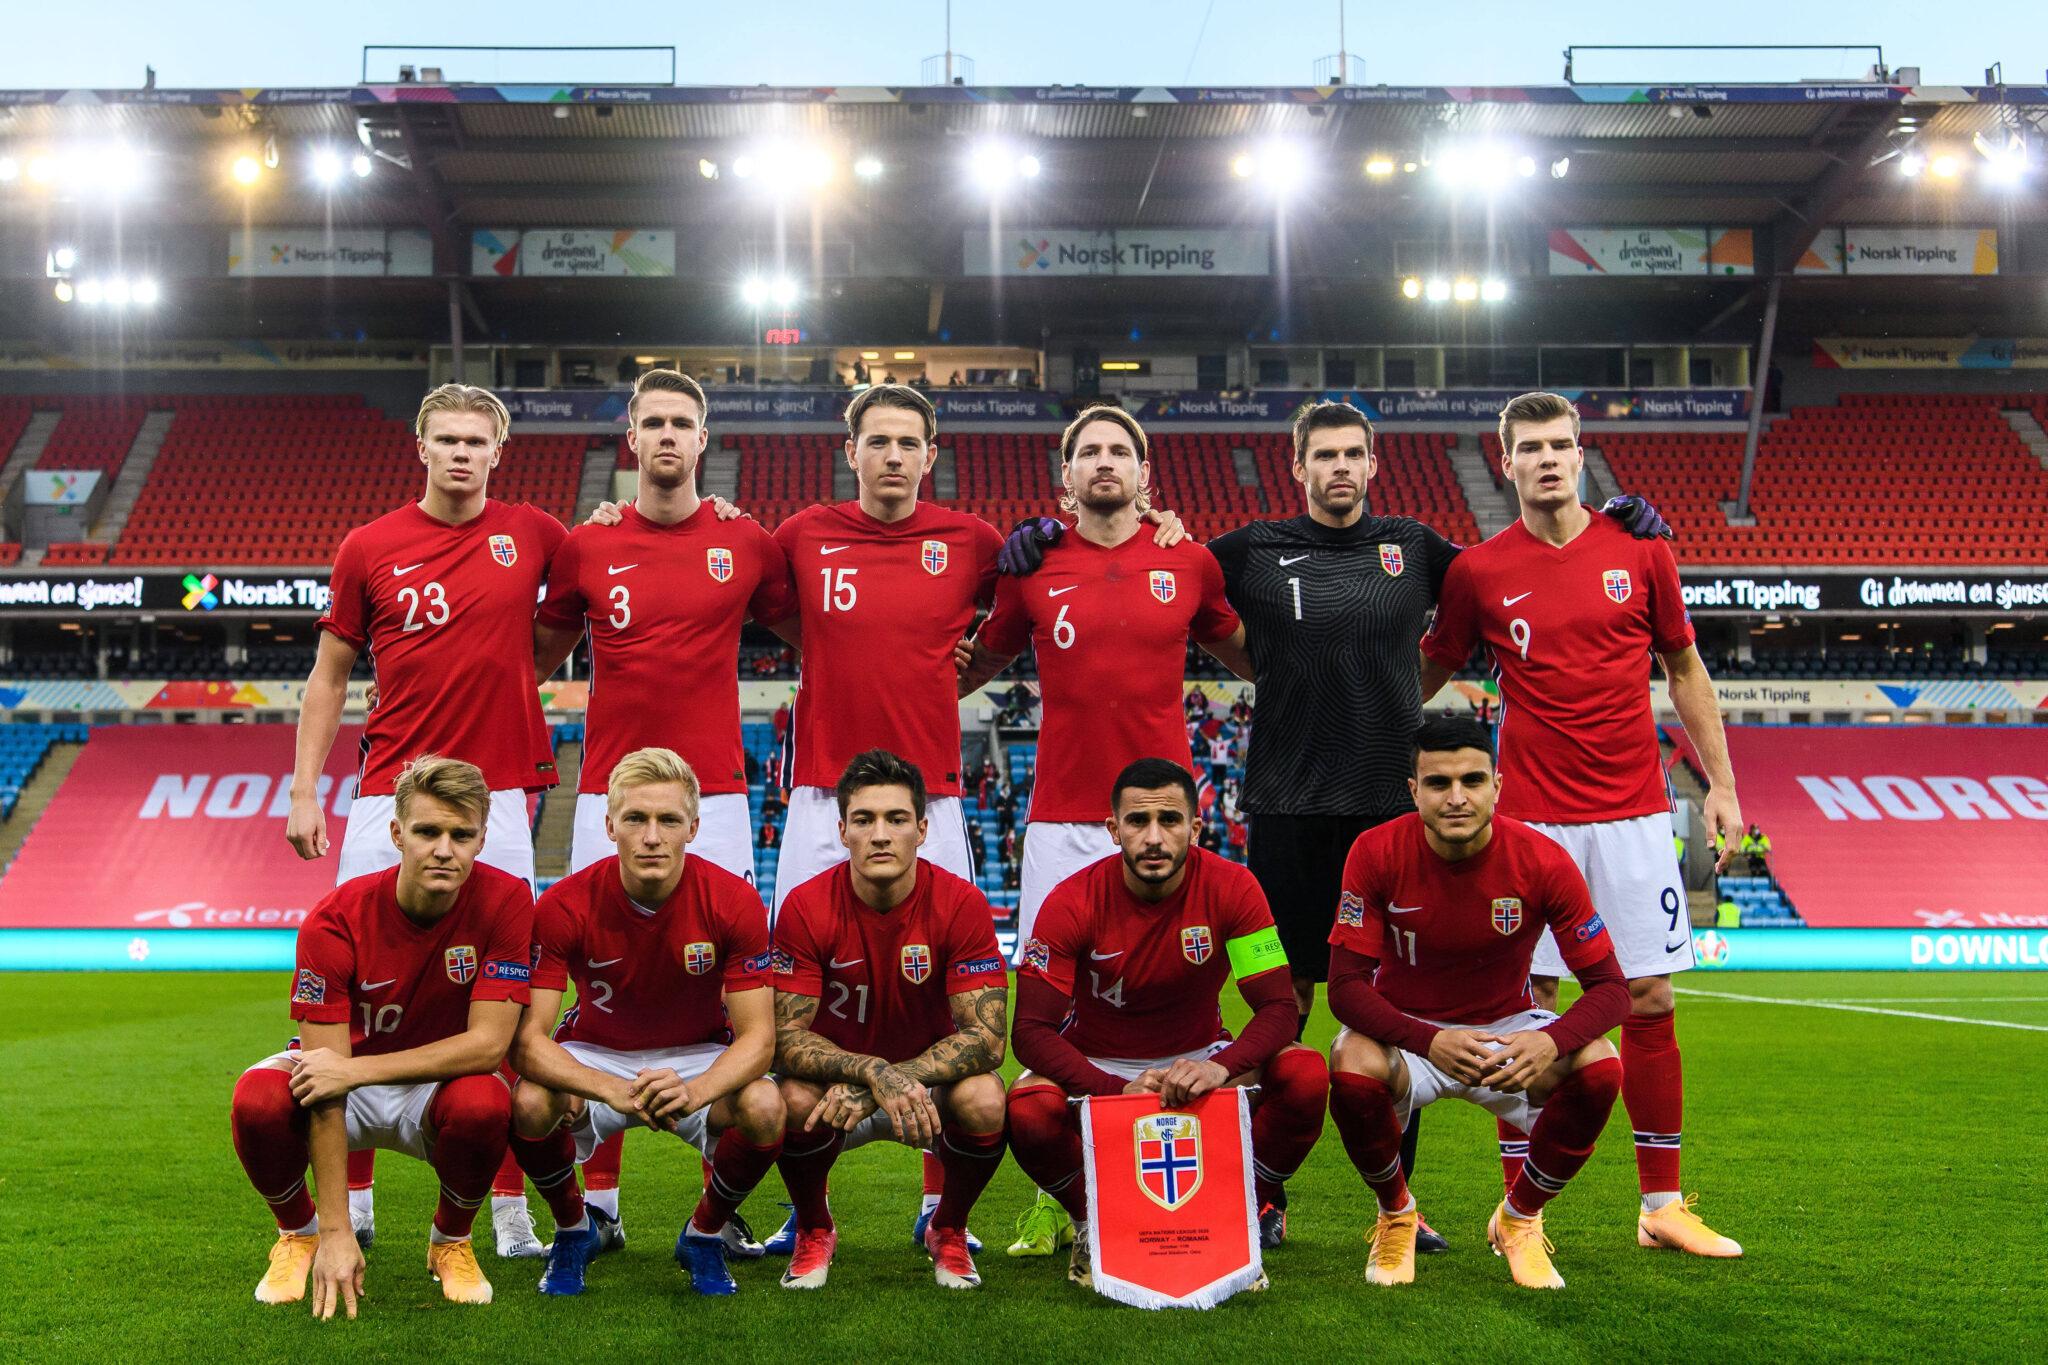 Norvegia - Foto Imago OneFootball